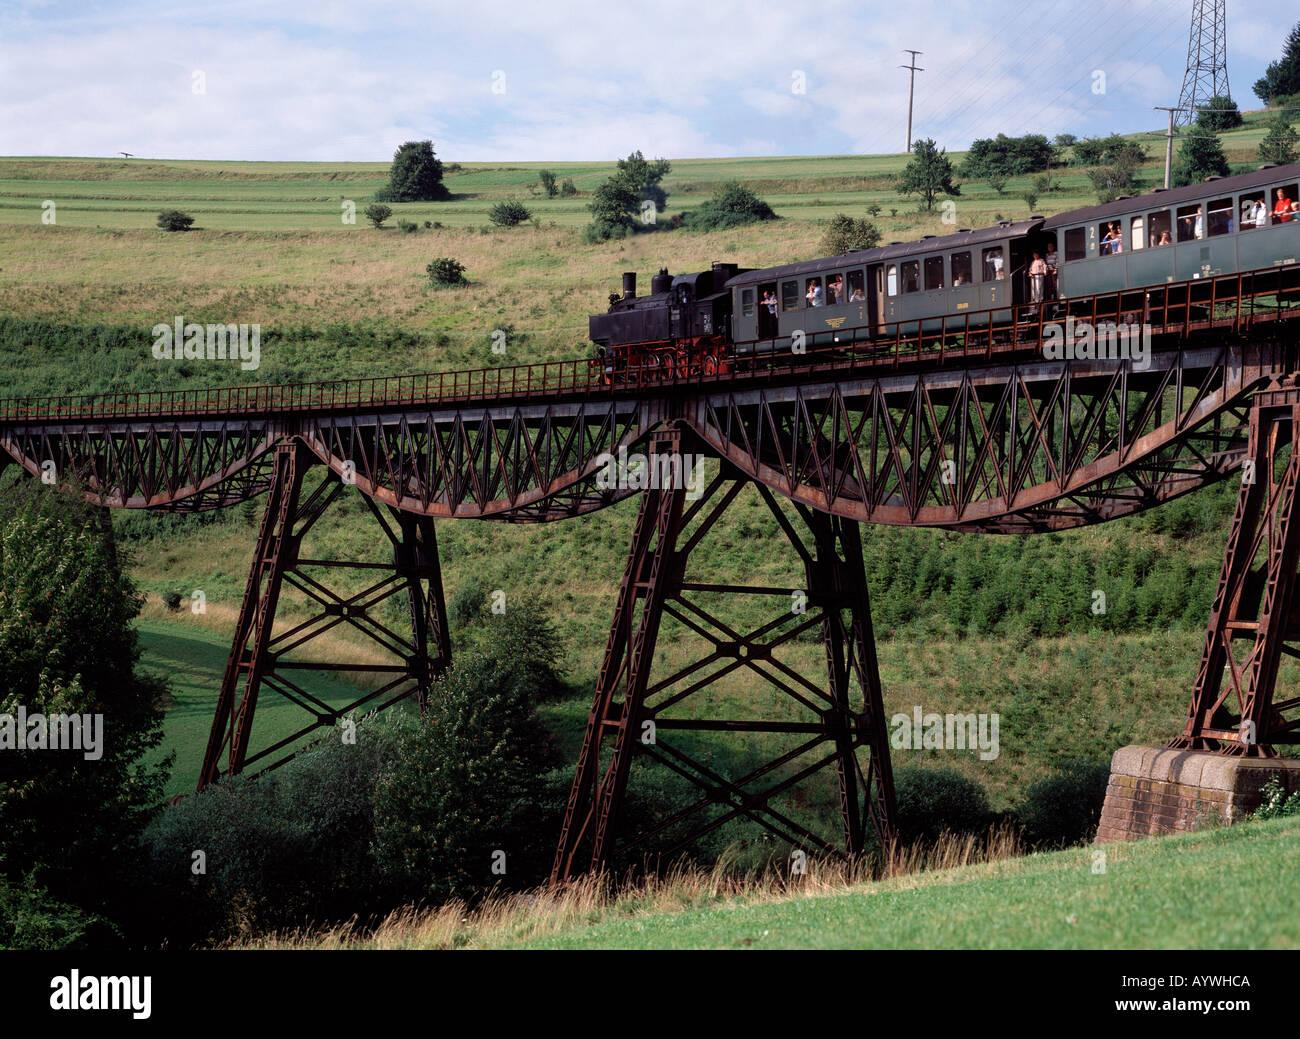 Museumseisenbahn Auf Einem Viadukt, Sauschwaenzlebahn, Blumberg (Baden), Baden-Württemberg Stockbild